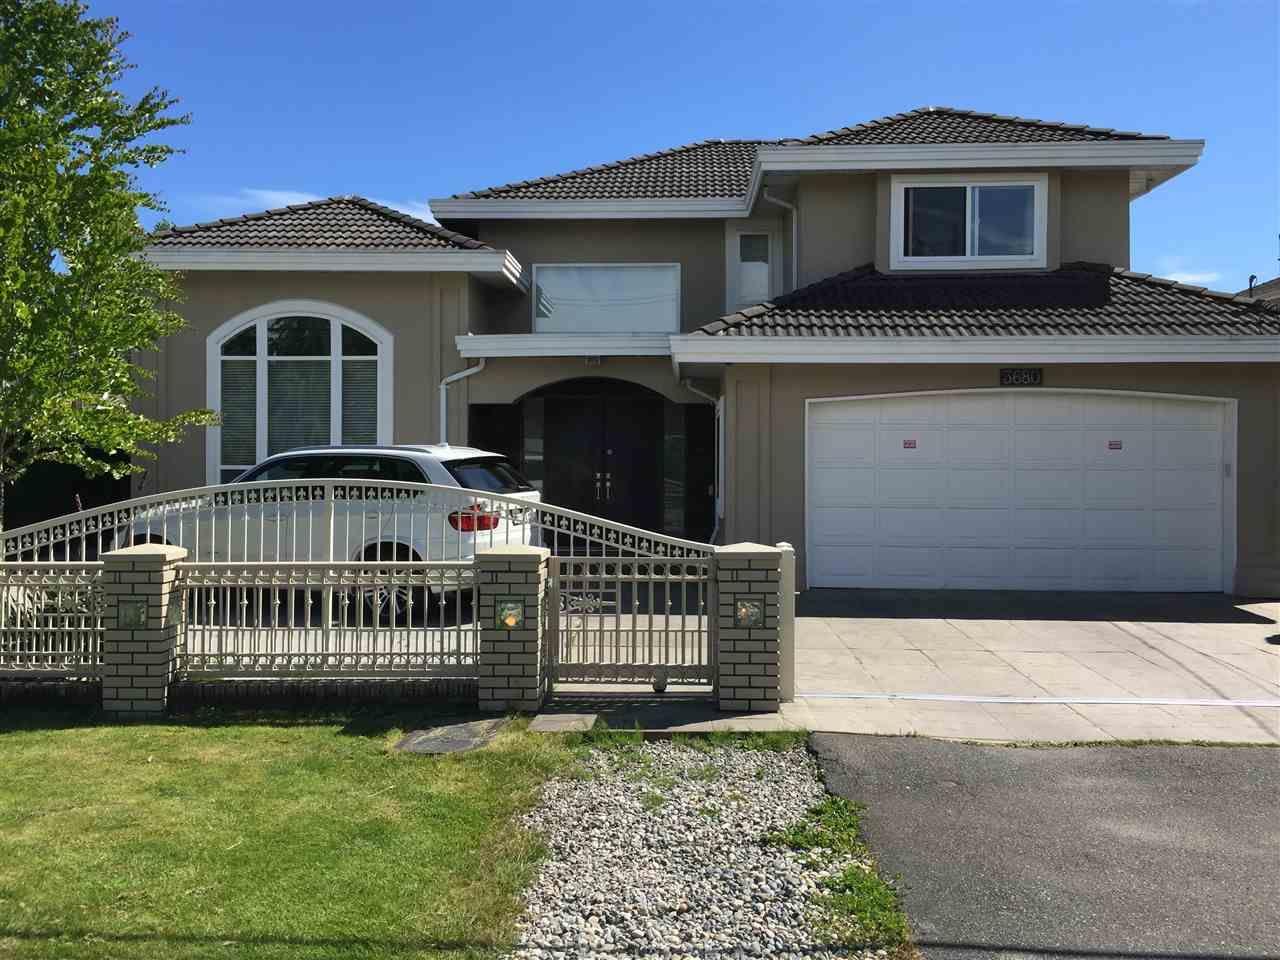 Main Photo: 3680 LAMOND AVENUE in : Seafair House for sale : MLS®# R2074704